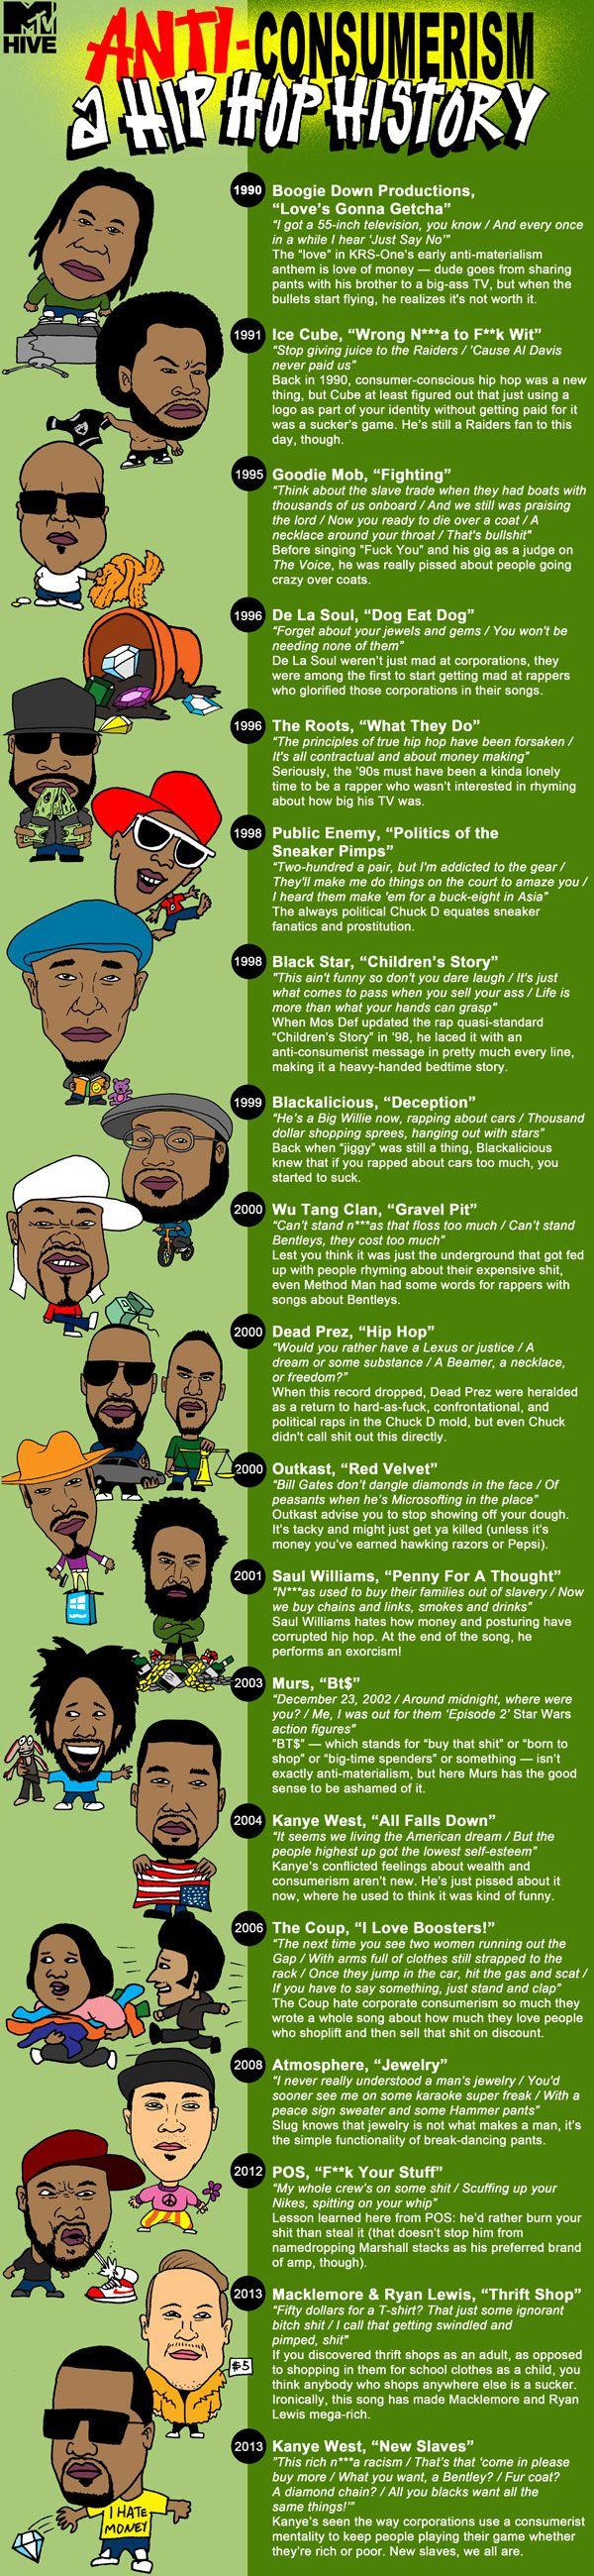 Anti-Consumerism: A Hip Hop History | Tweets, ILLUSTRATED